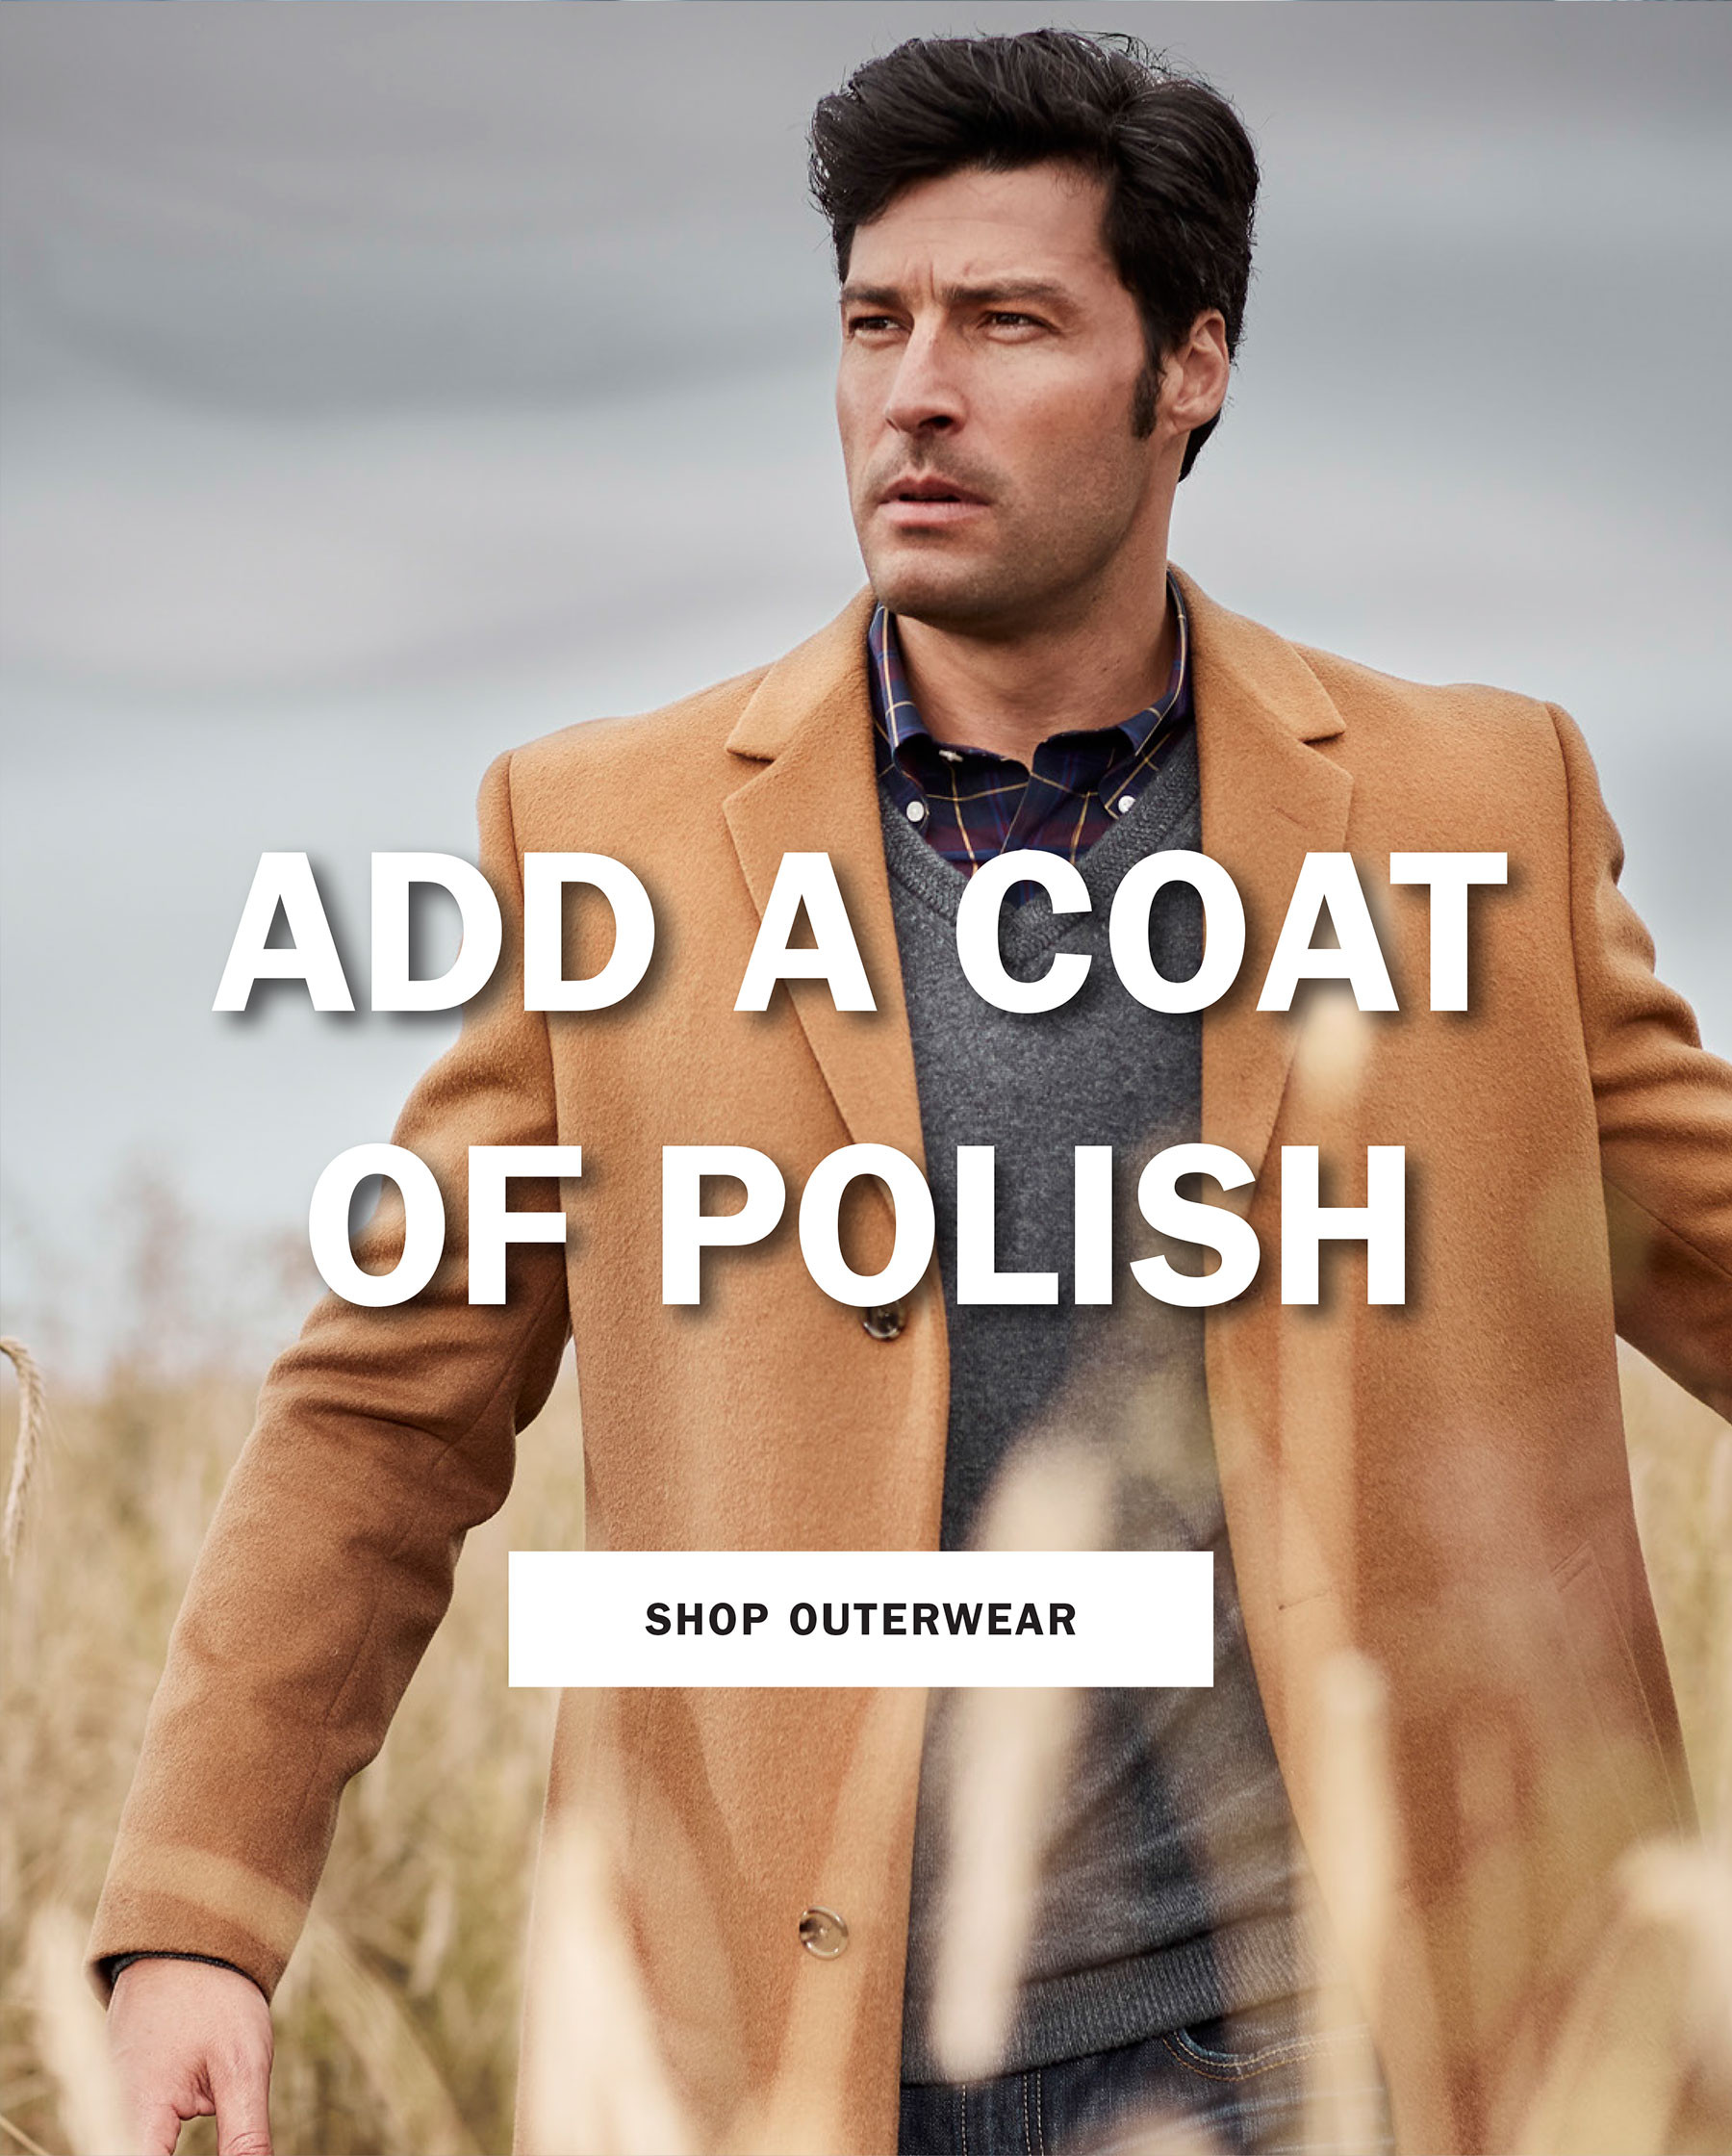 ADD A COAT OF POLISH   SHOP OUTERWEAR